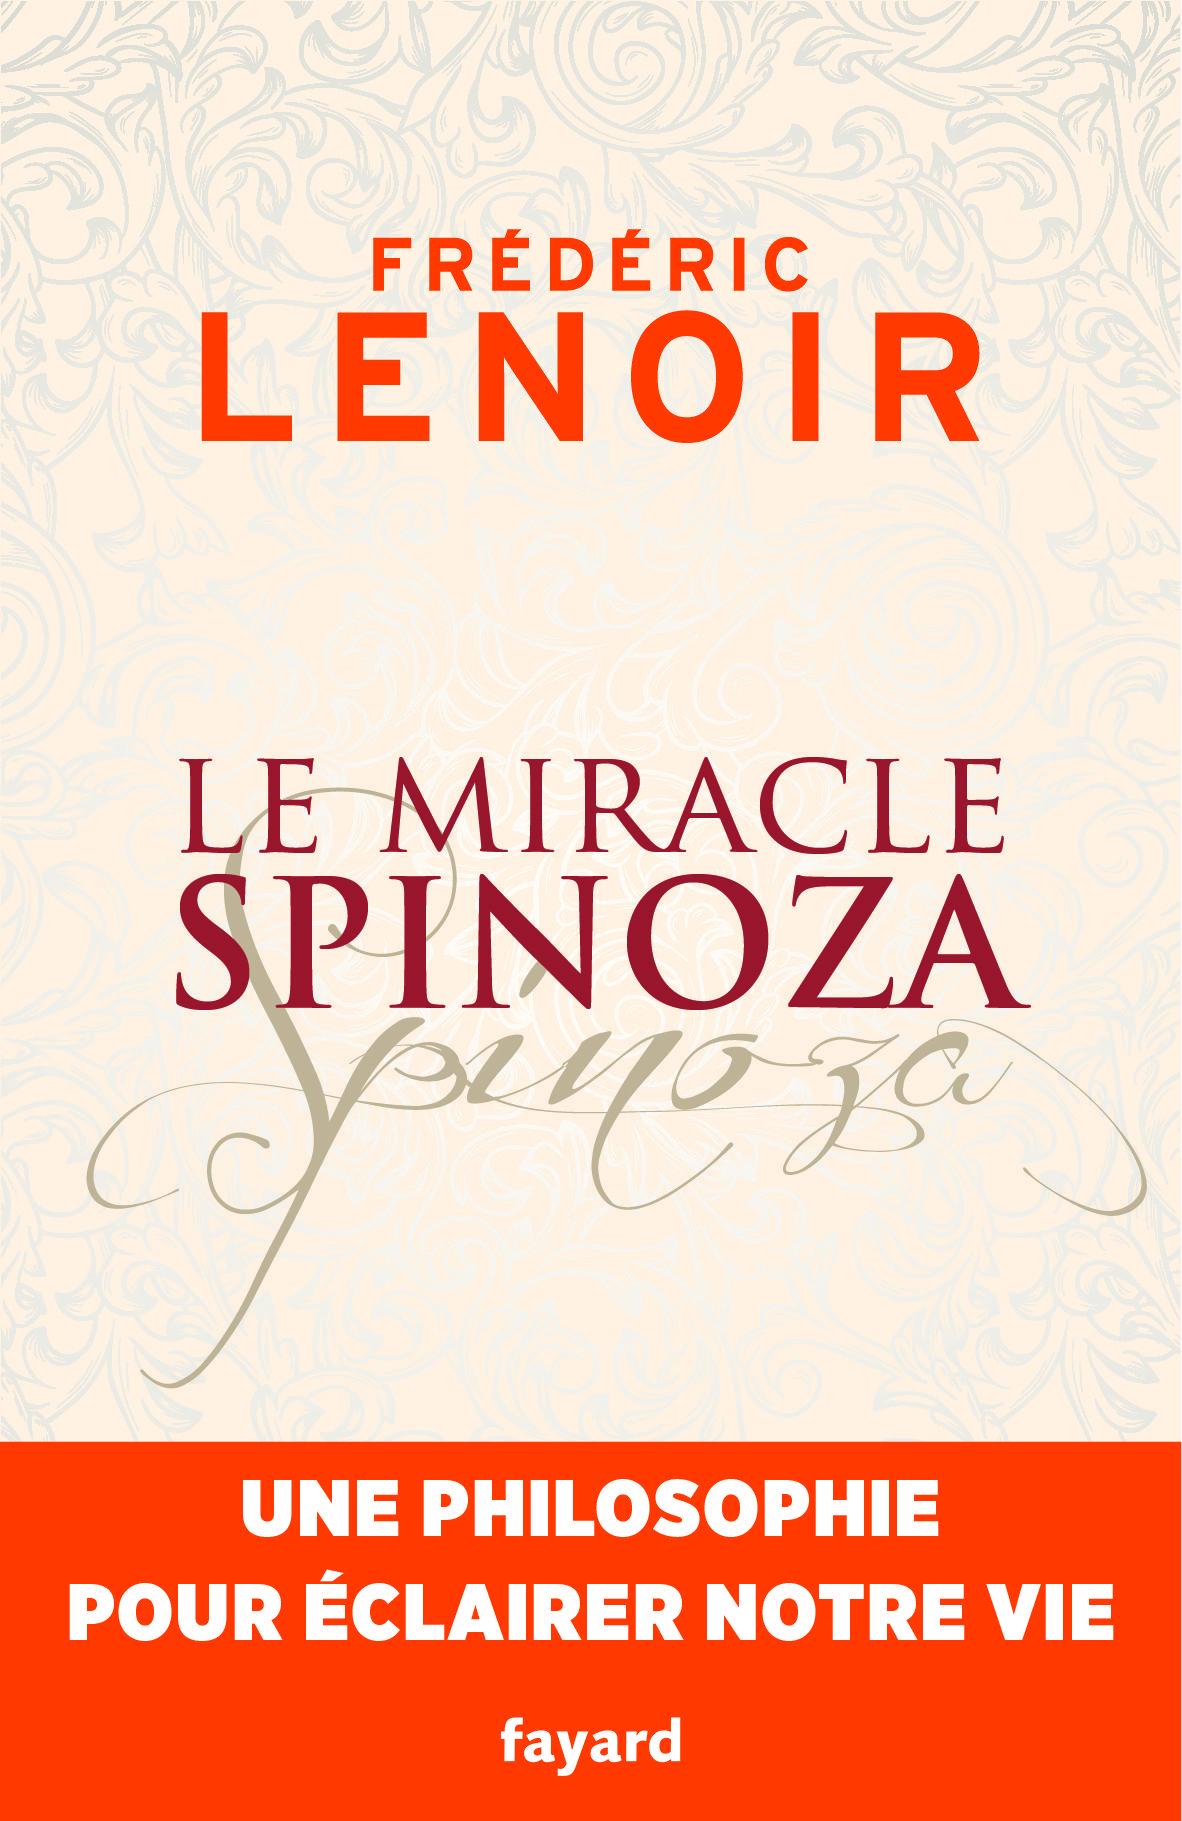 Le Miracle Spinoza de Frédéric Lenoir